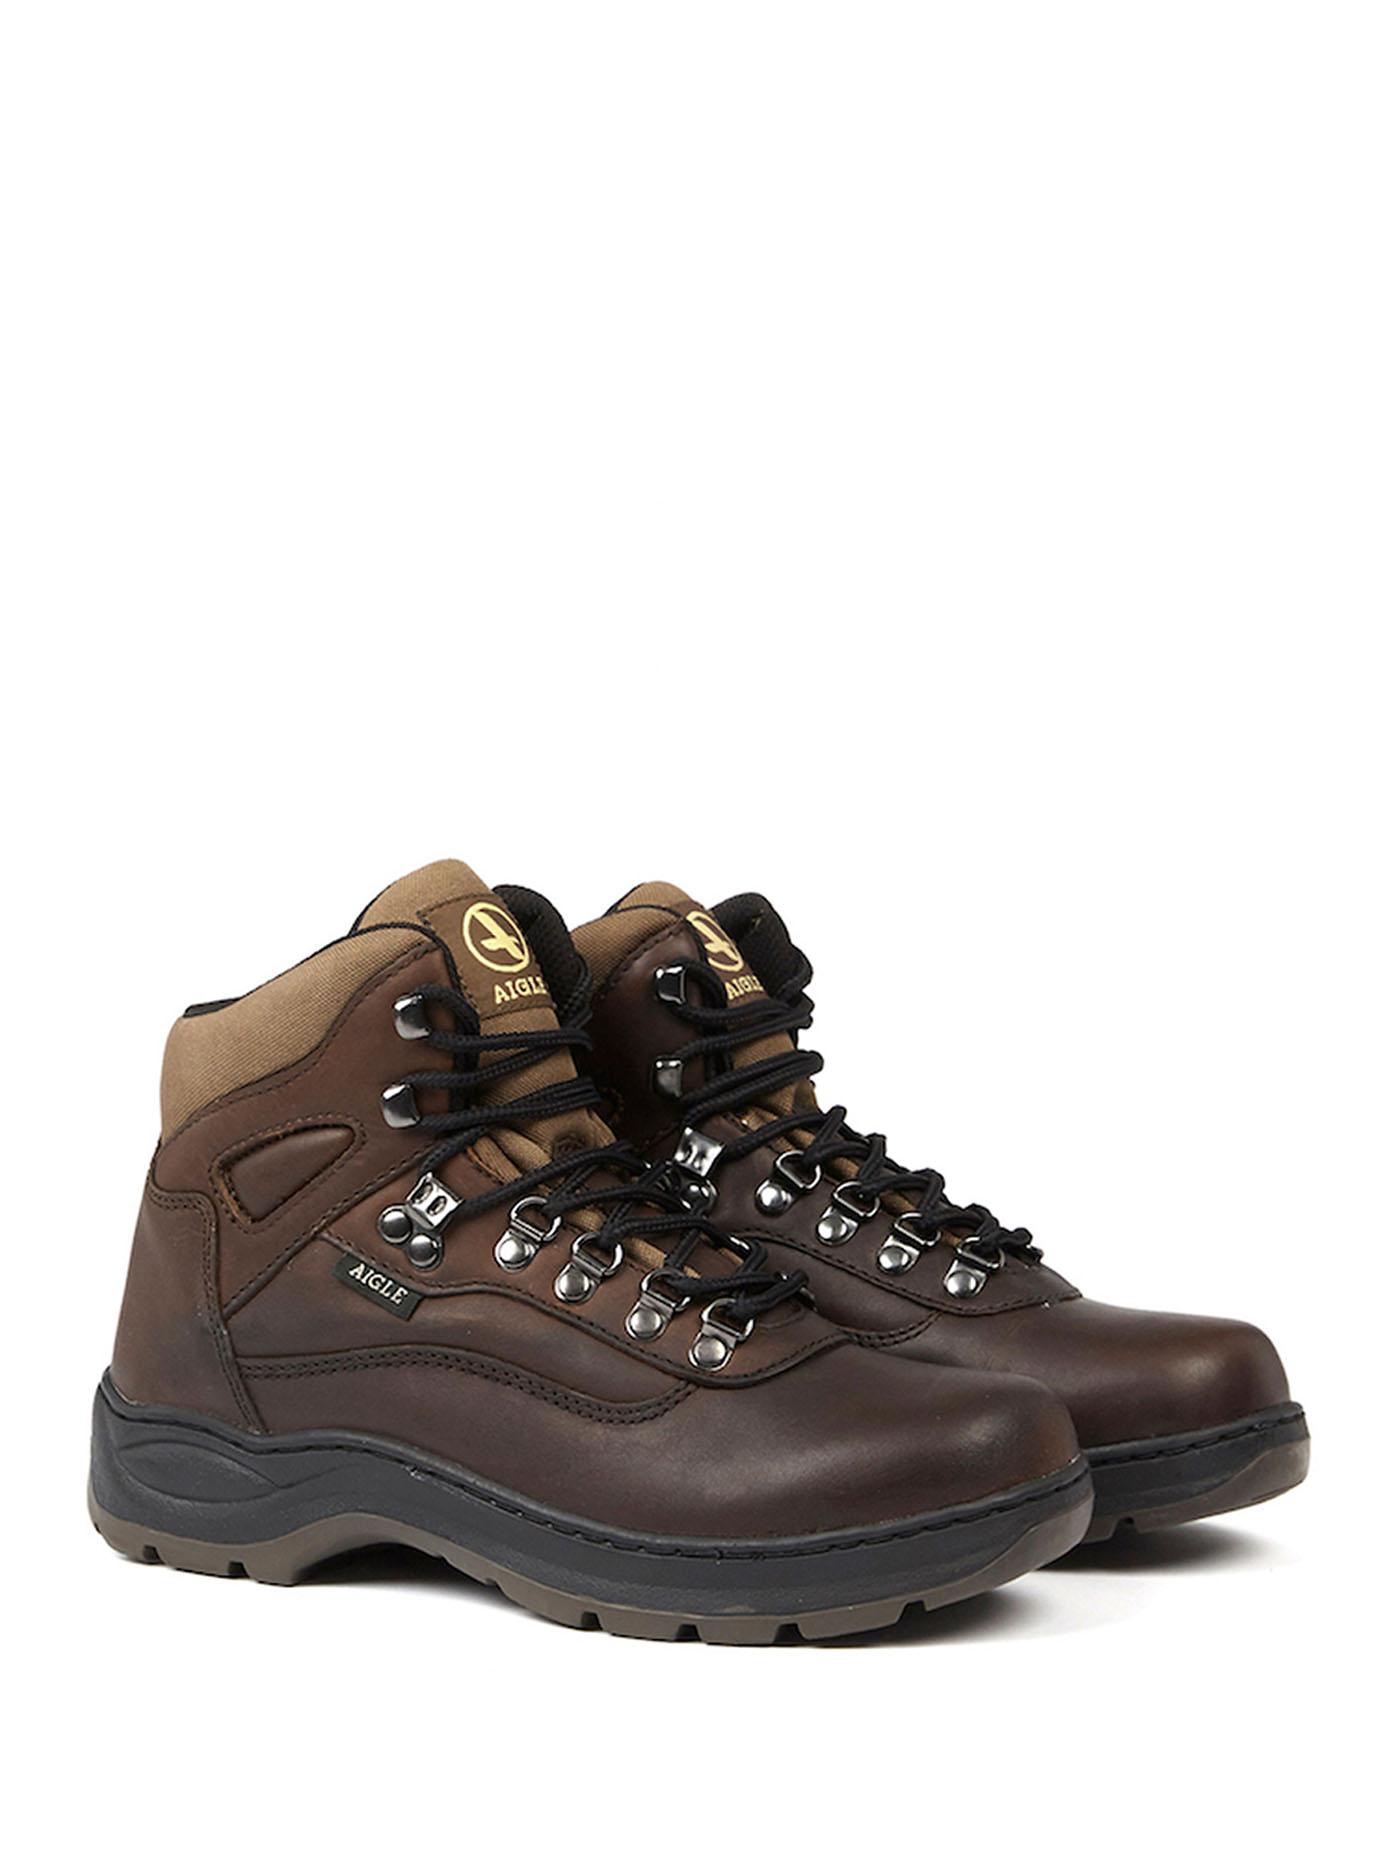 Chaussures cuir Mixte Picardiehomme | AIGLE